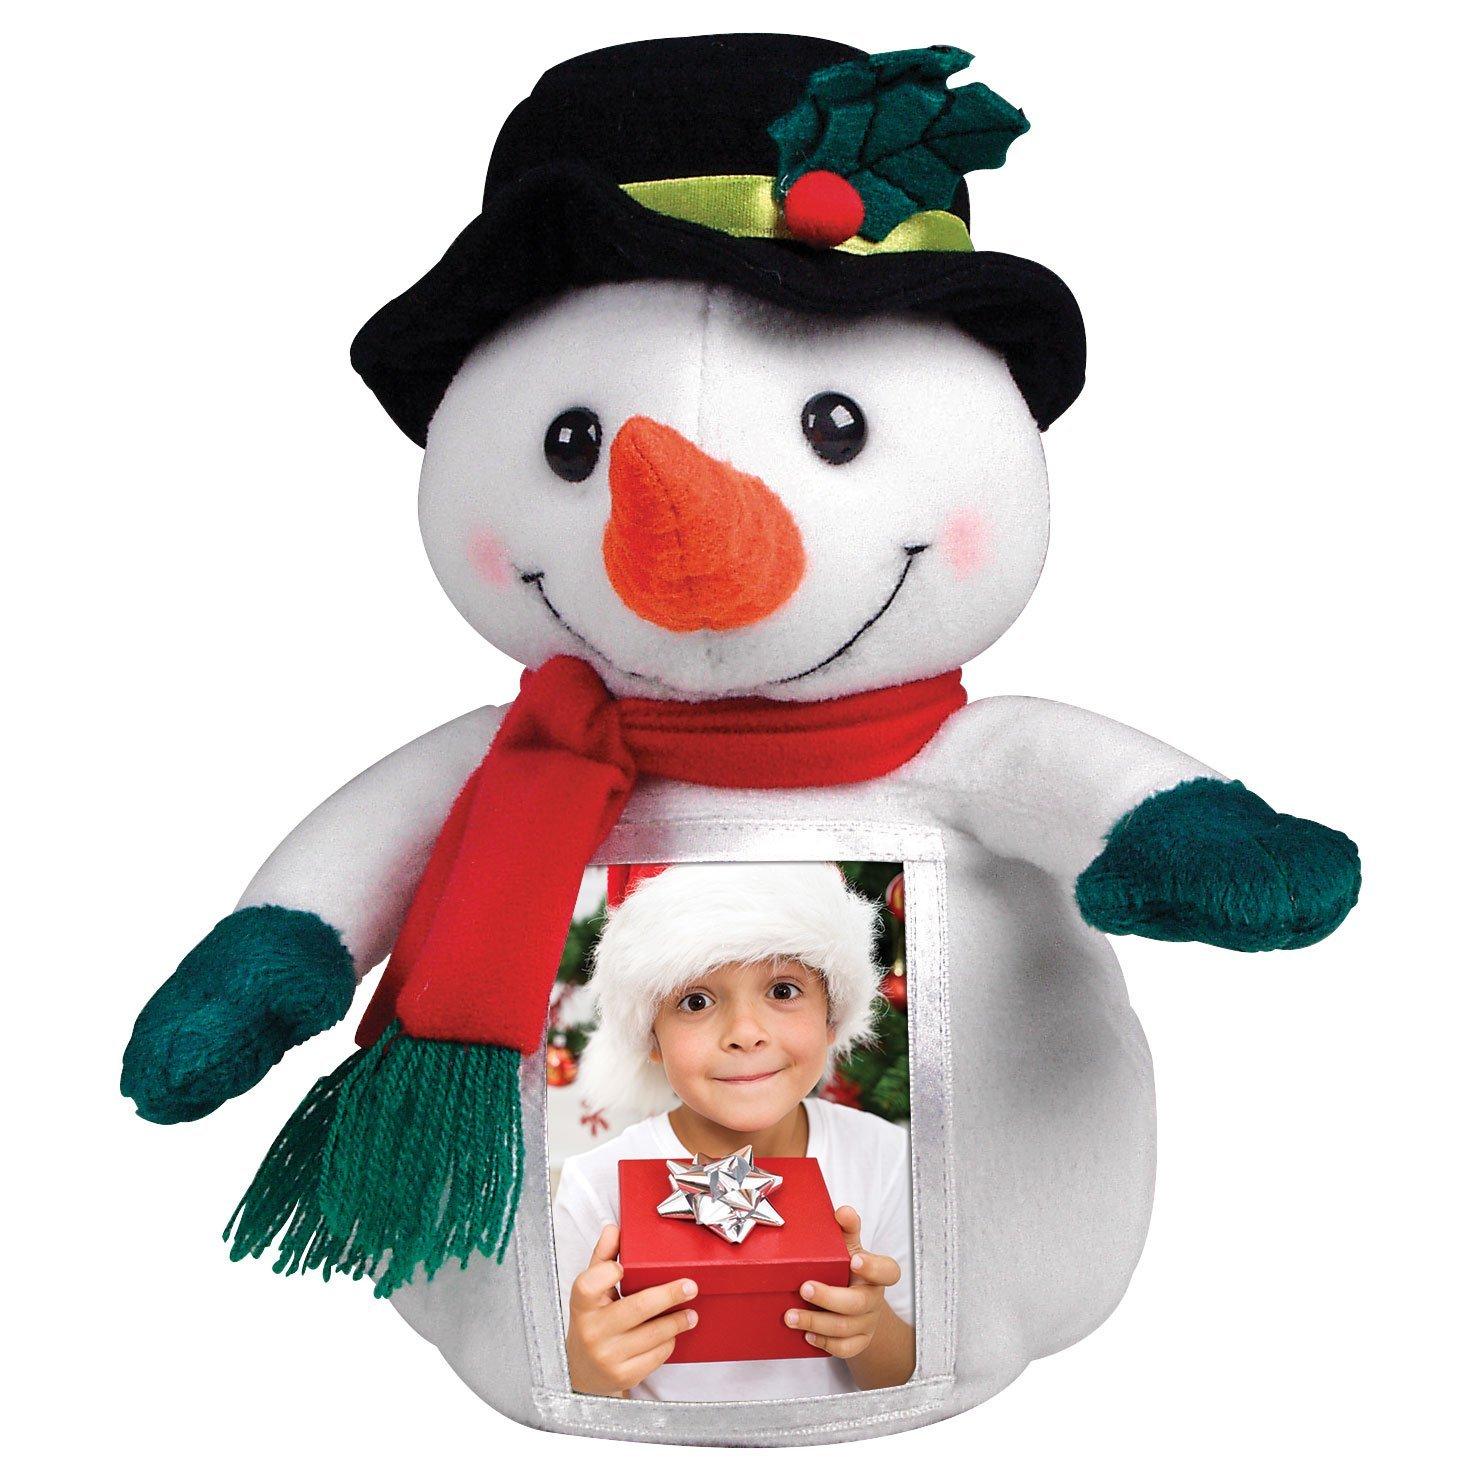 Snowman Plush Picture Frame